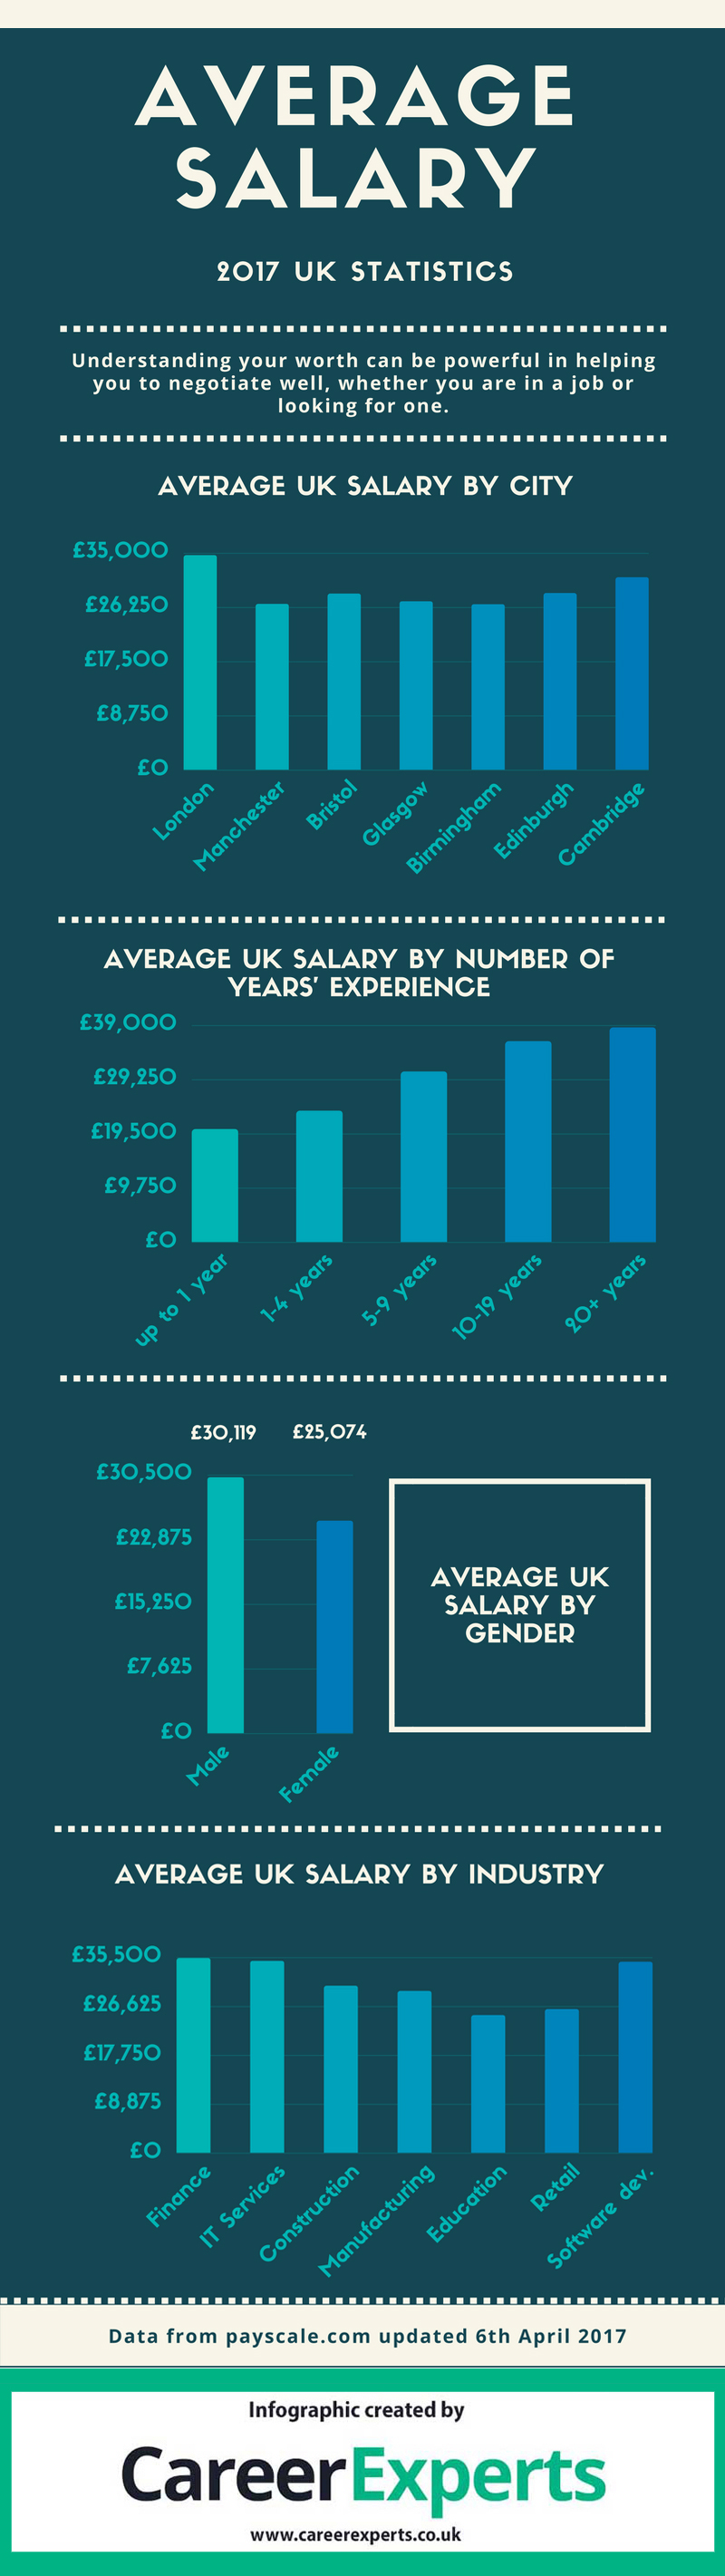 salary statistics 2017 infographic